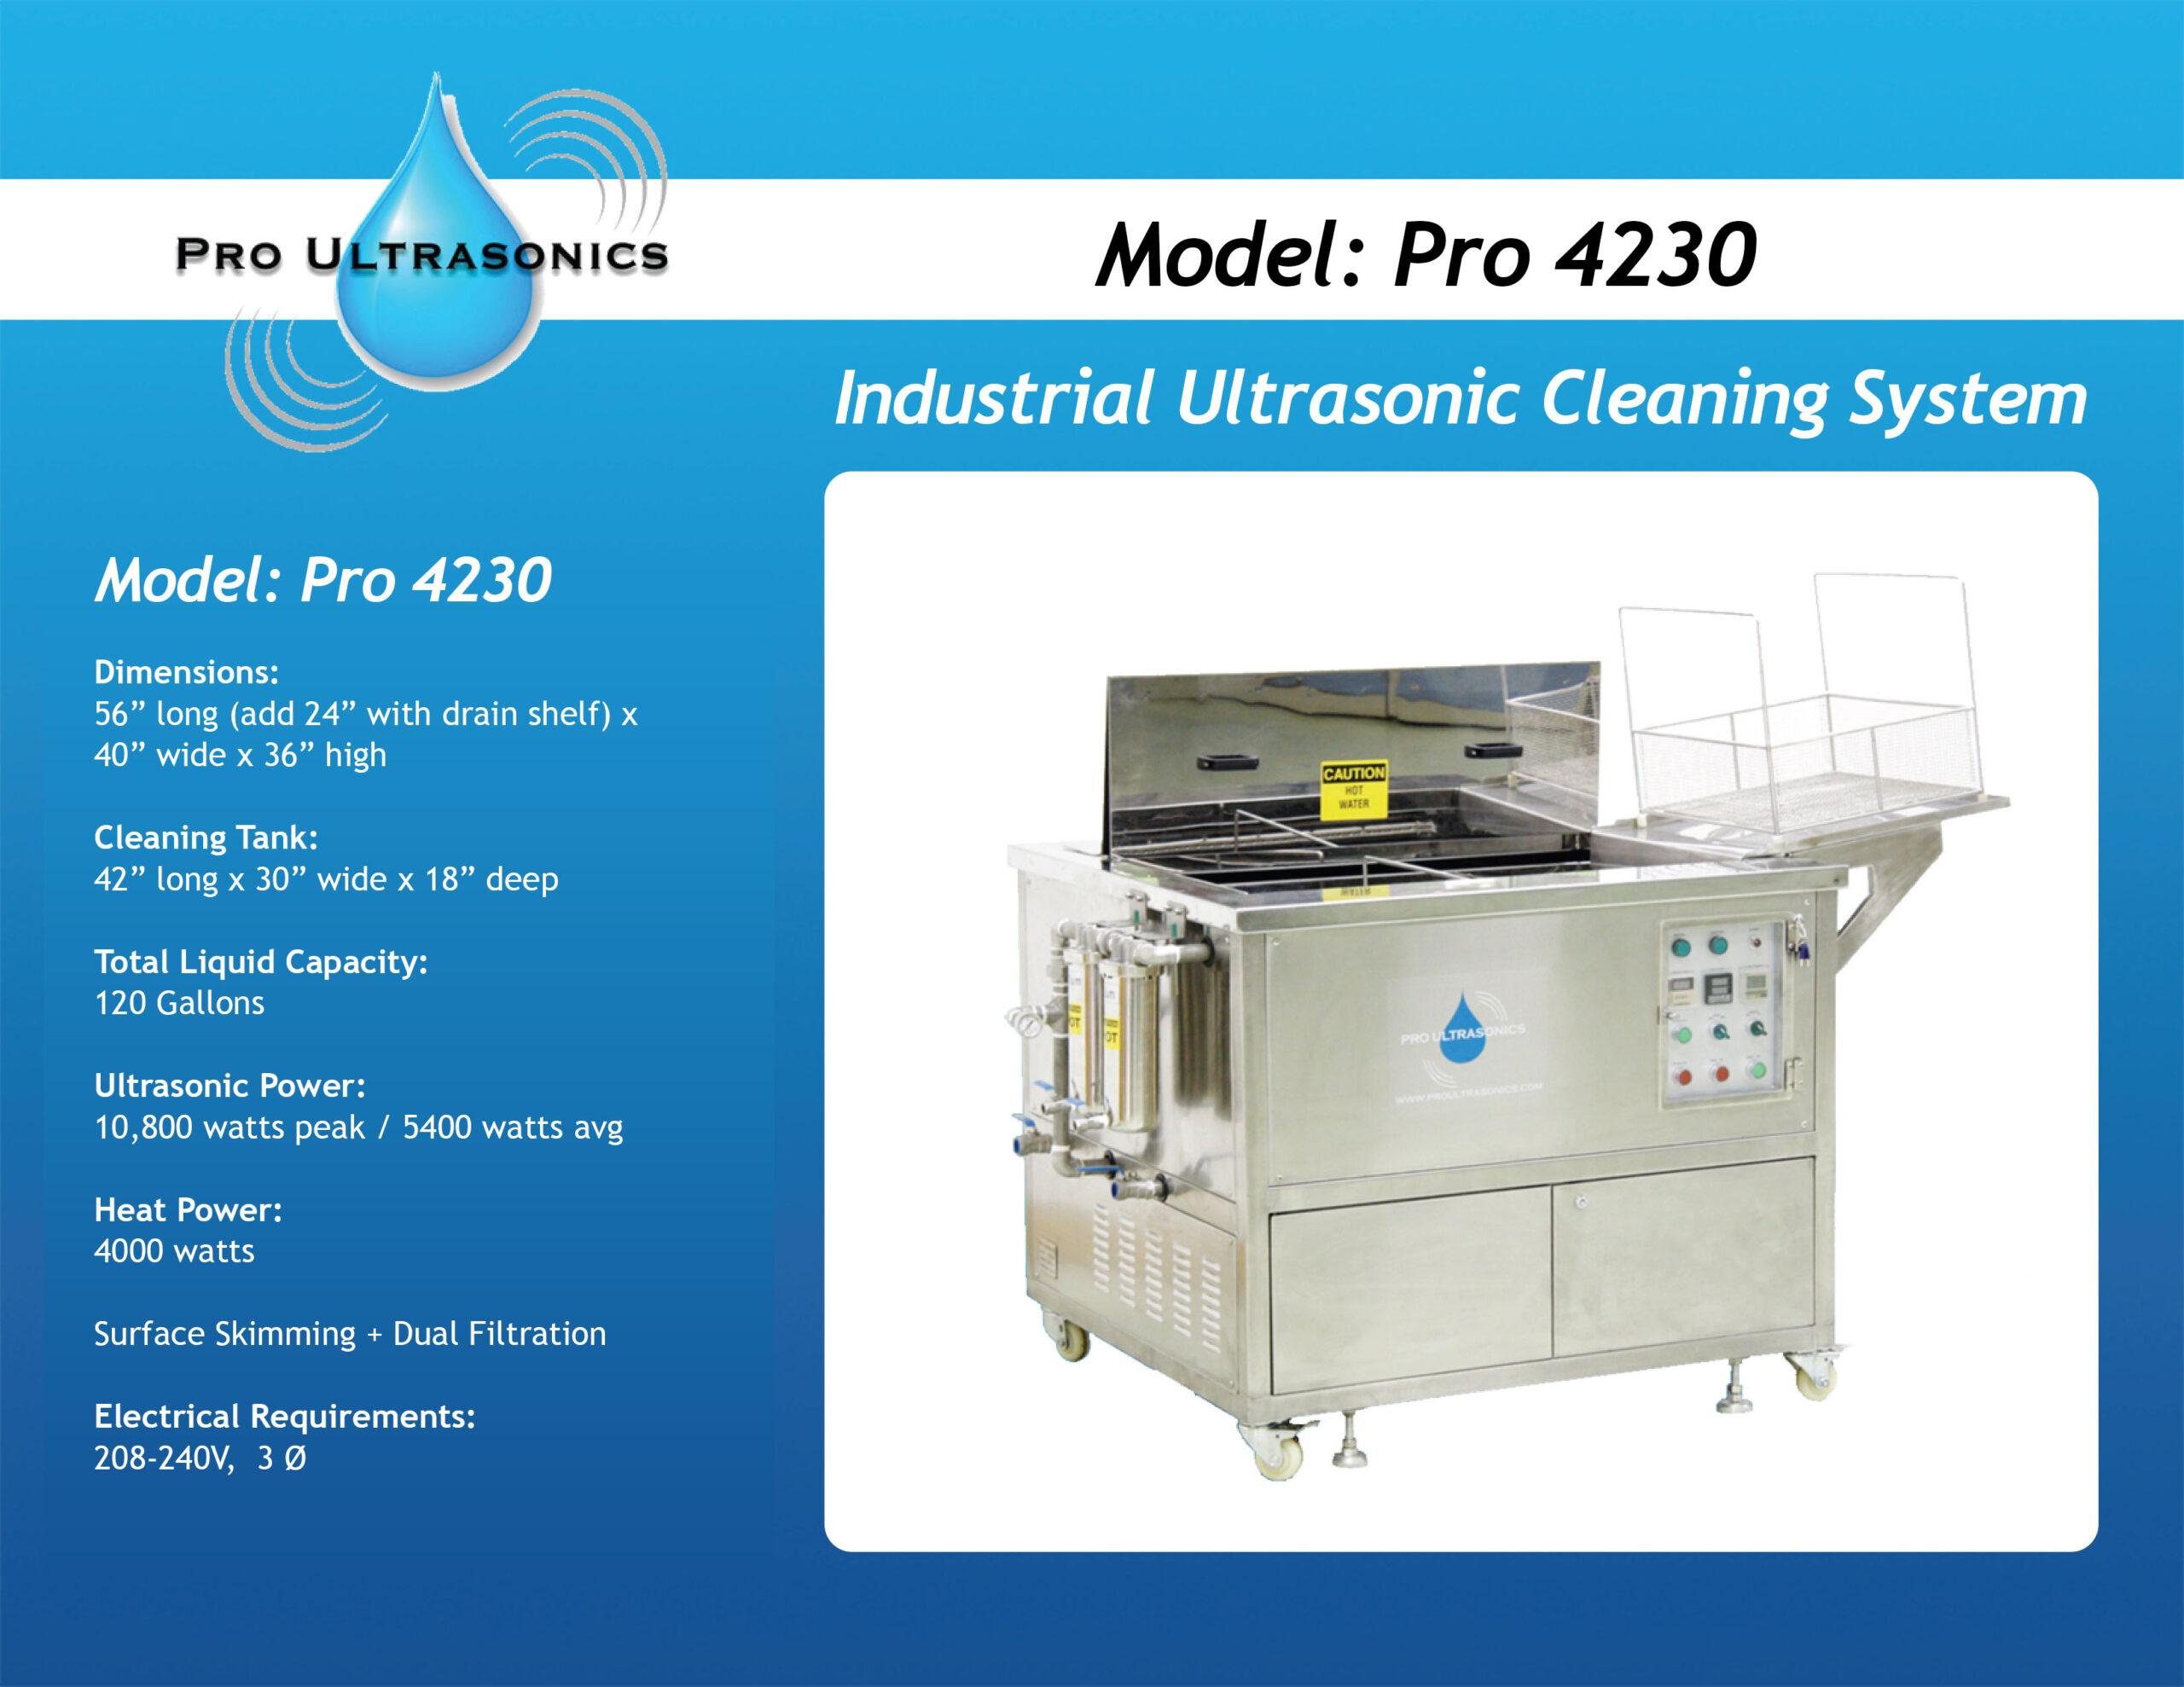 Pro 4230